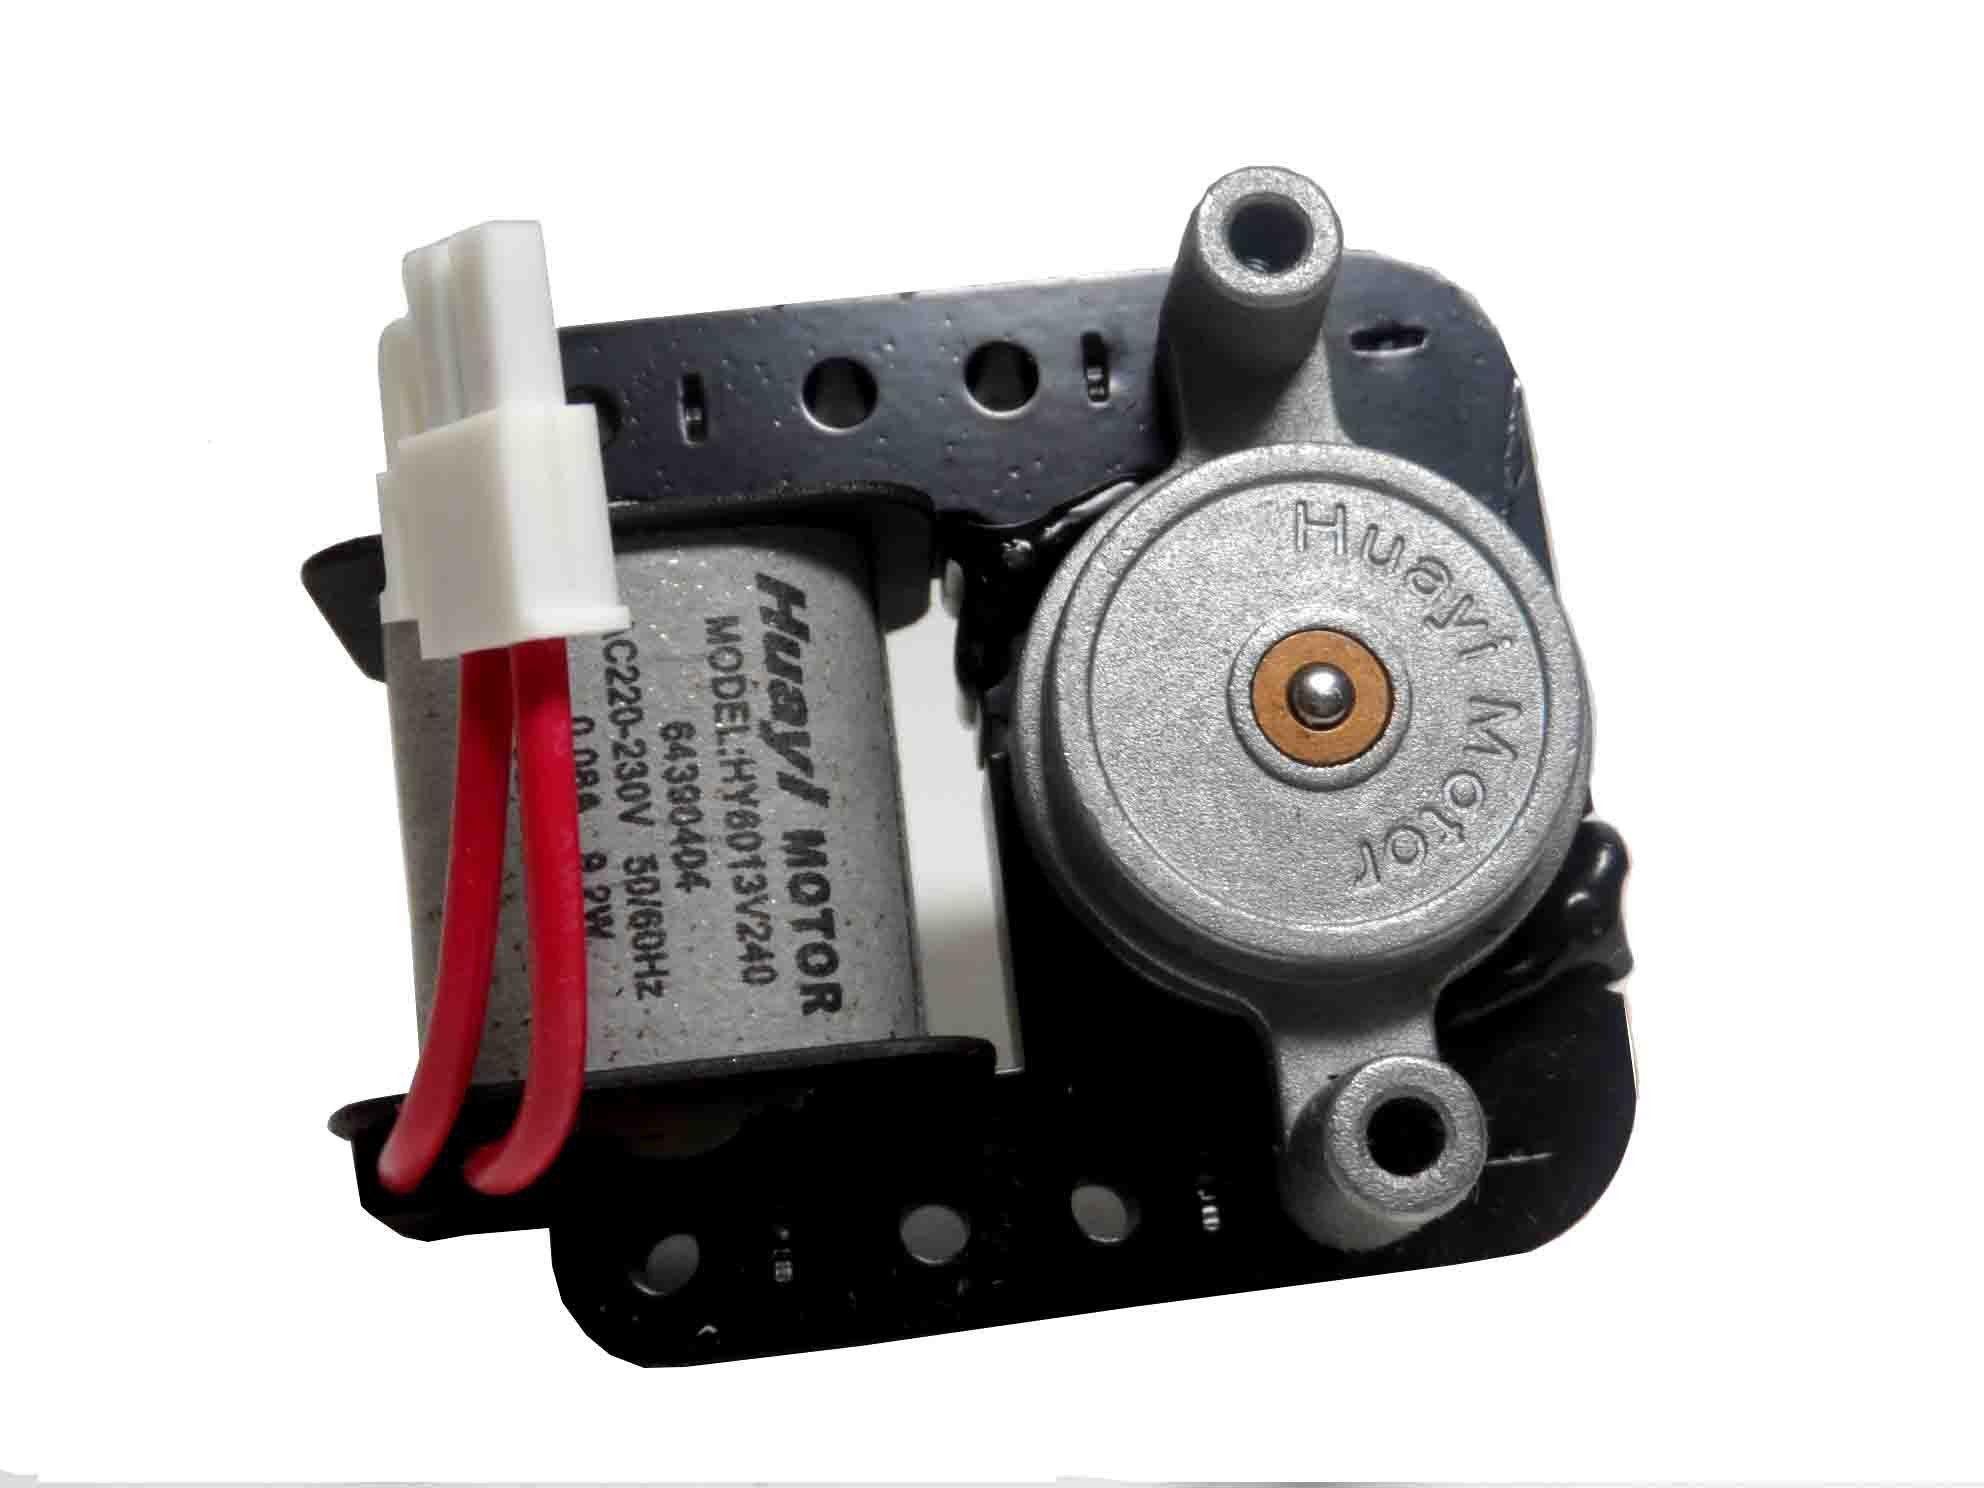 MOTOVENTILADOR CONDENSADOR 220V DF80/DI80X/DF62/DF80X/DF62X/DFI80/DFW64/DT80X 64390404